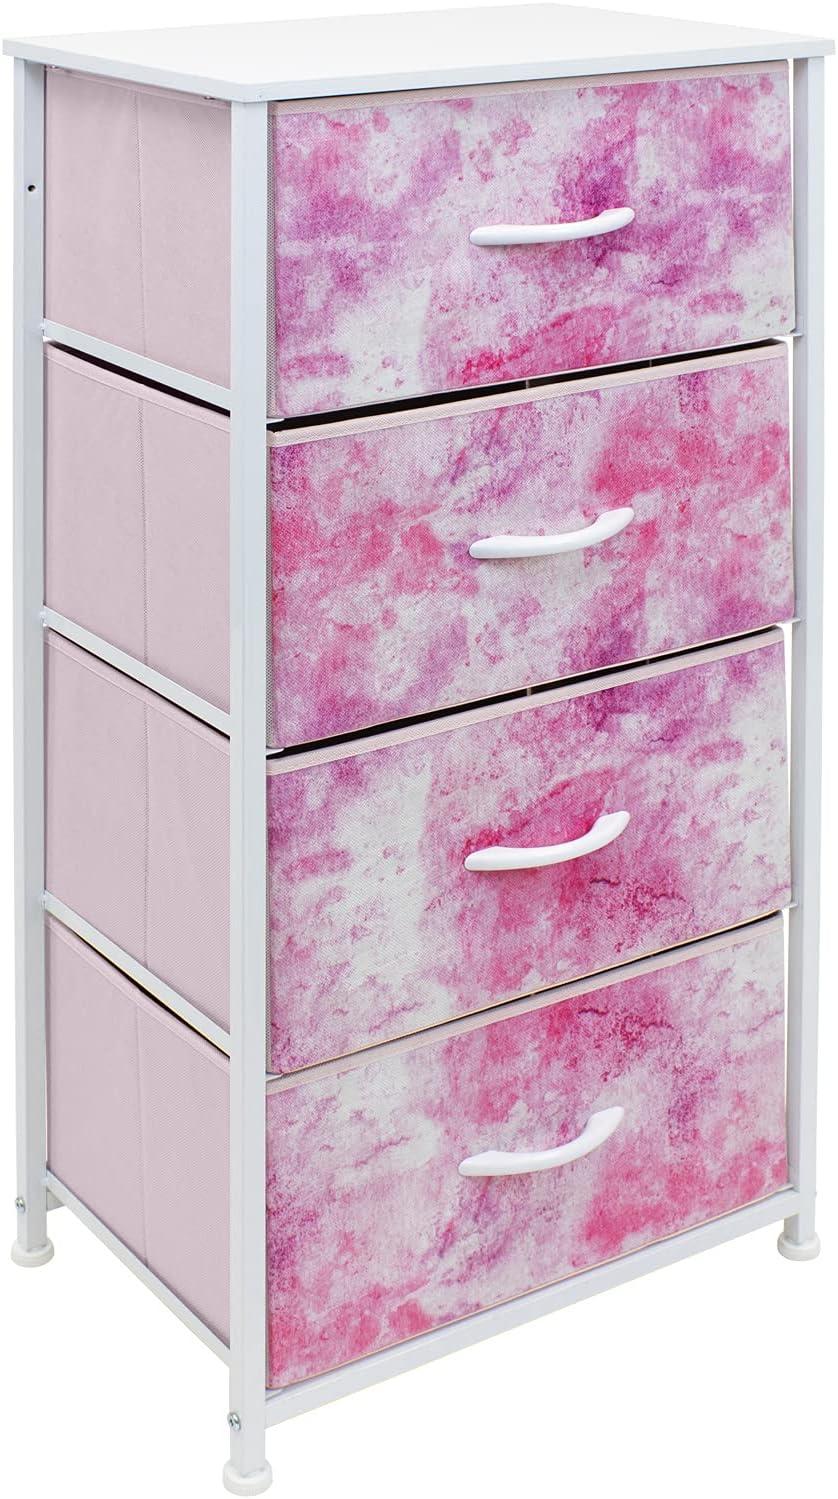 Sorbus Dresser Storage Tower, Organizer Drawers for Closet Boys & Girls Bedroom, Bedside Furniture, Chest for Home, College Dorm, Steel Frame, Wood Top, Tie-dye Fabric Bins(4-Drawer, Pink)